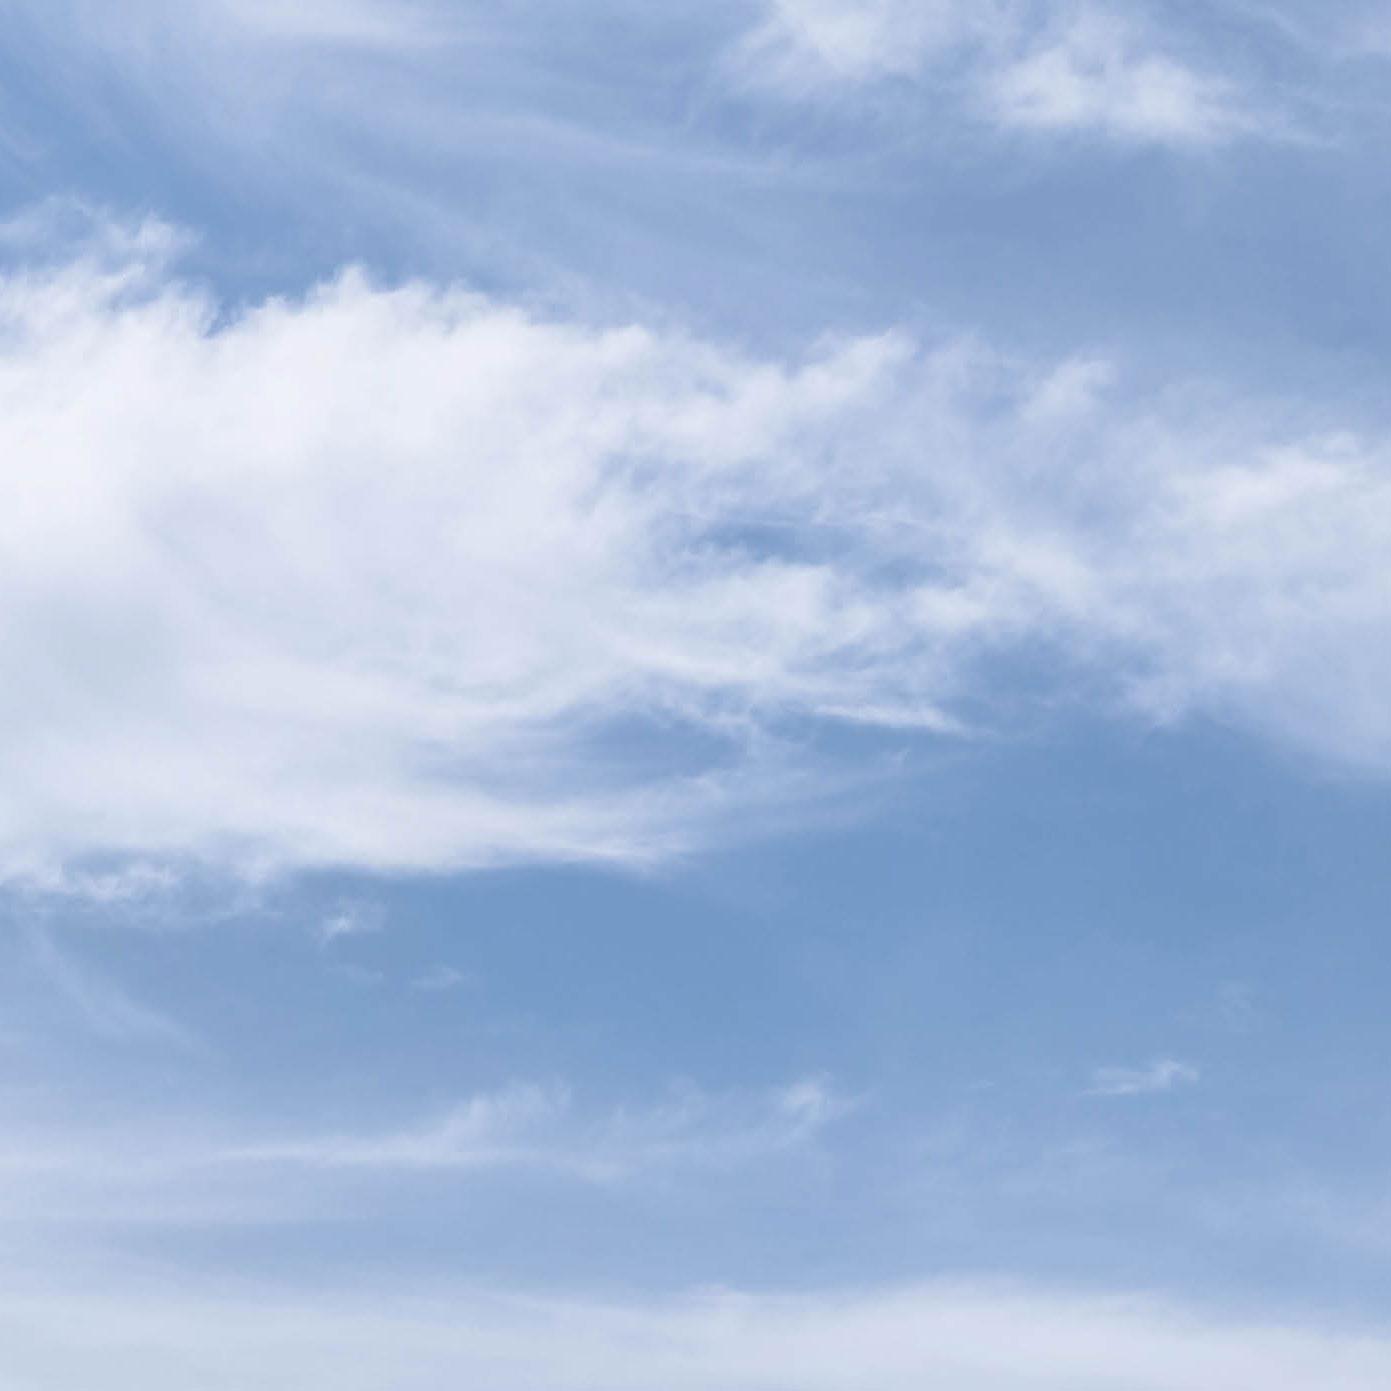 Endloser Himmel Teil 3 – Modellbahn Hintergrund 300cm x 50 cm 2